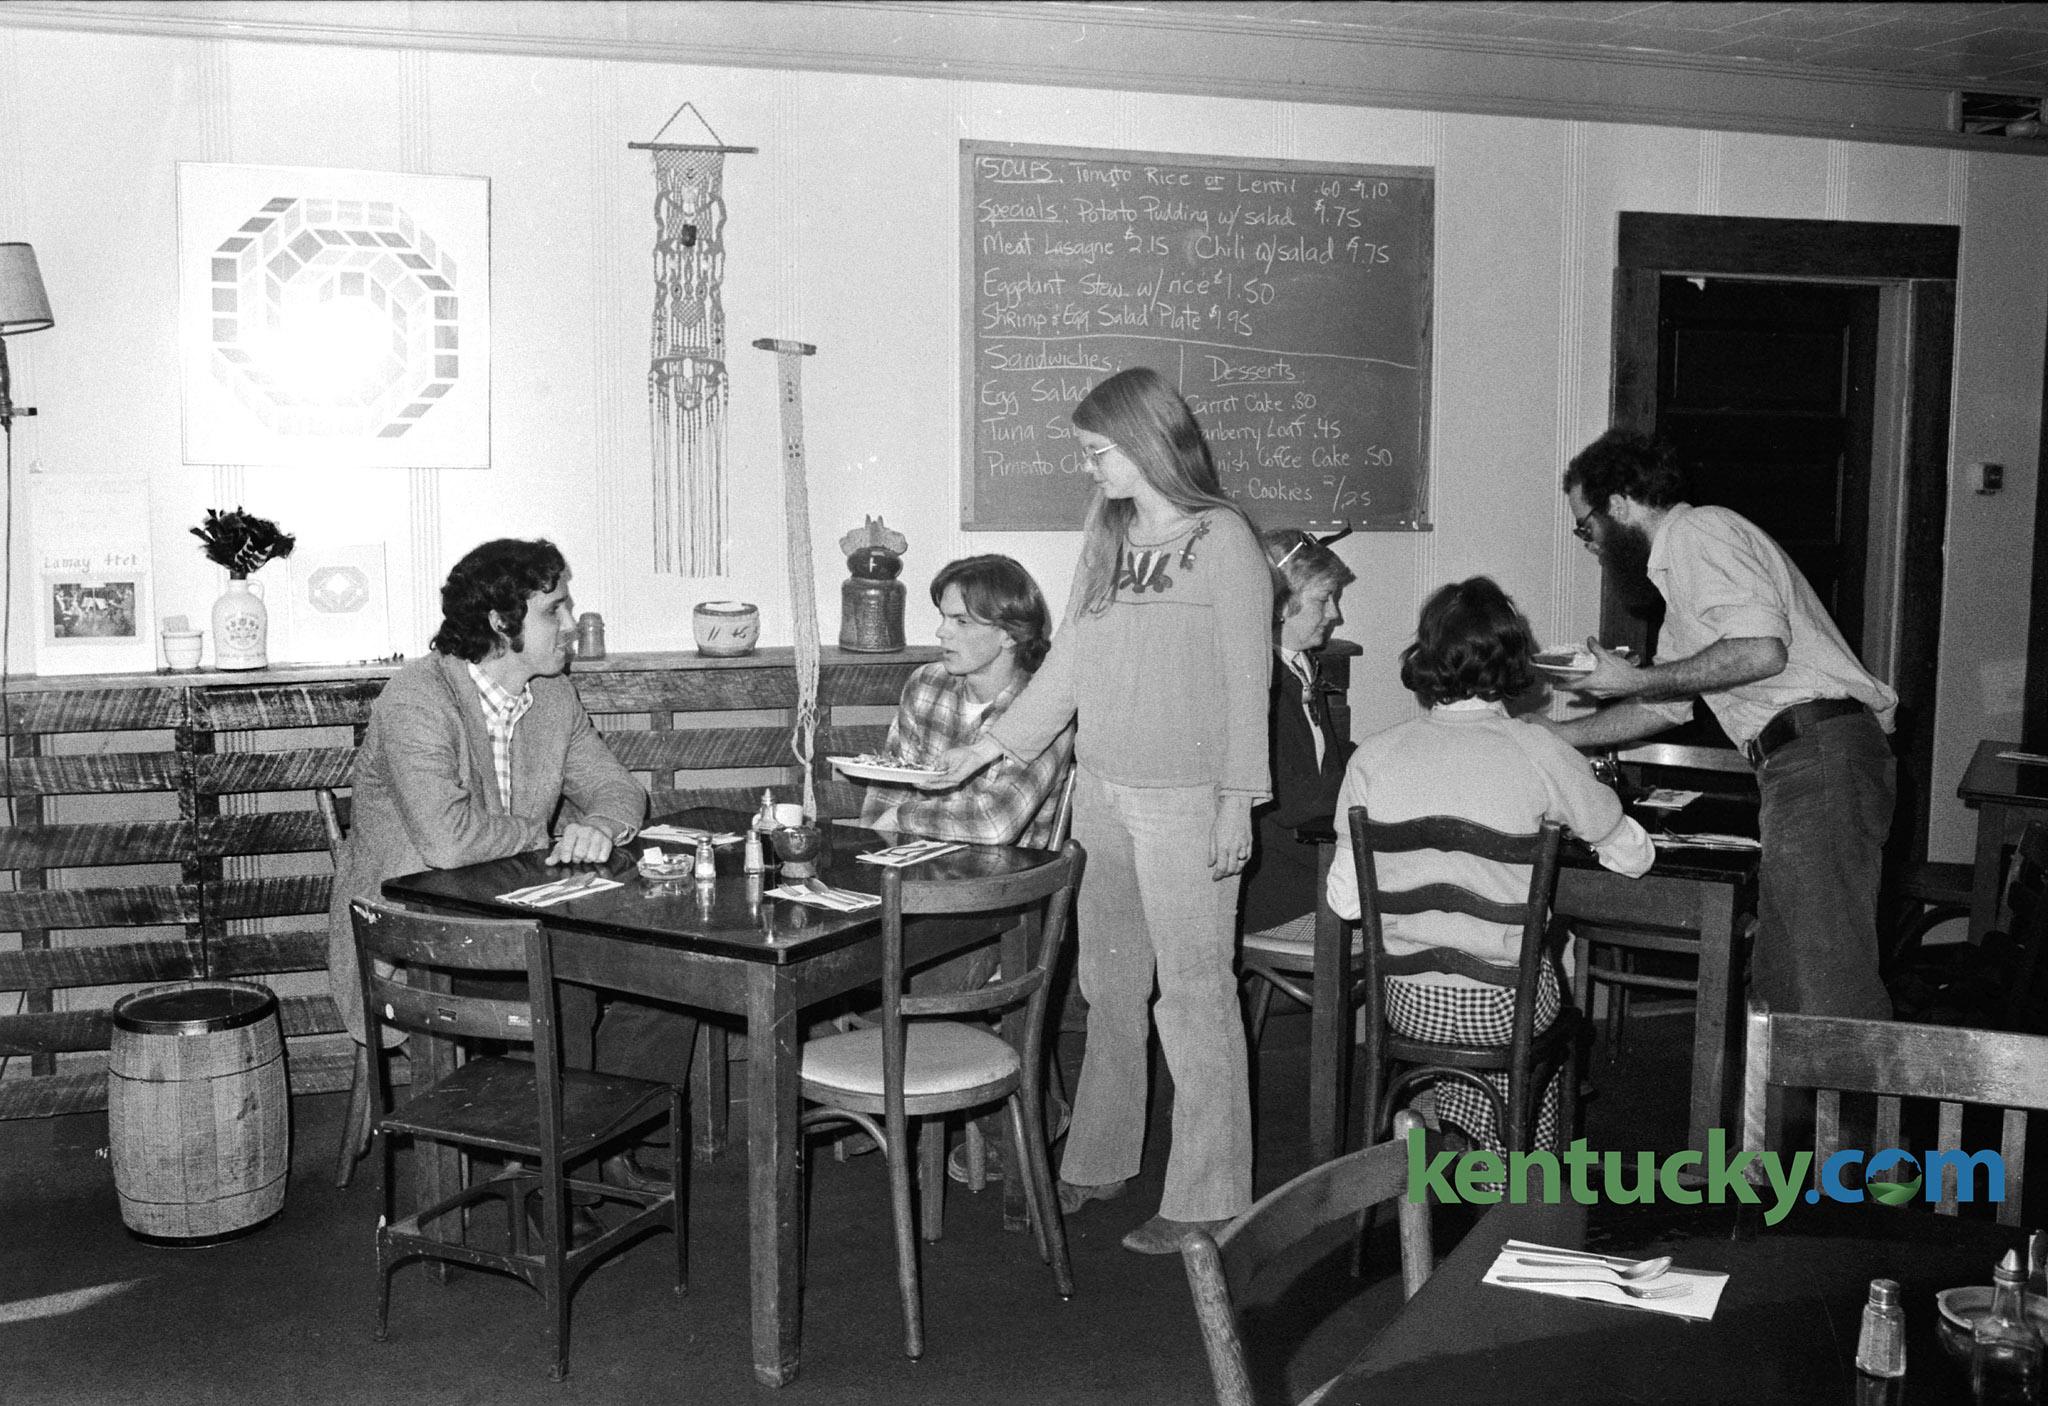 alfalfa restaurant, 1975 | kentucky photo archive